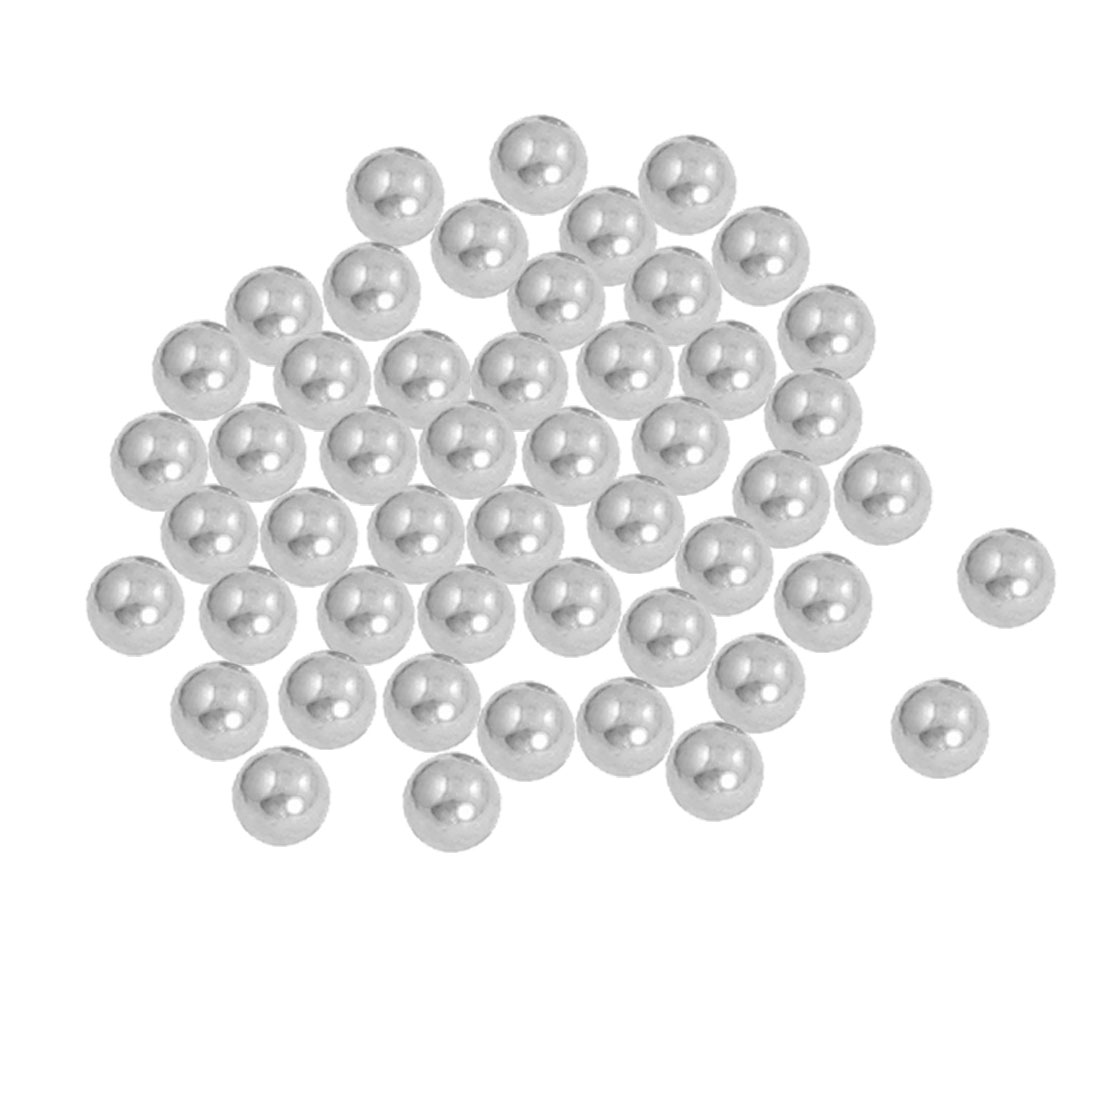 50 Pcs Replacing Parts 7mm Diameter Bike Bicyle Steel Ball Bearing